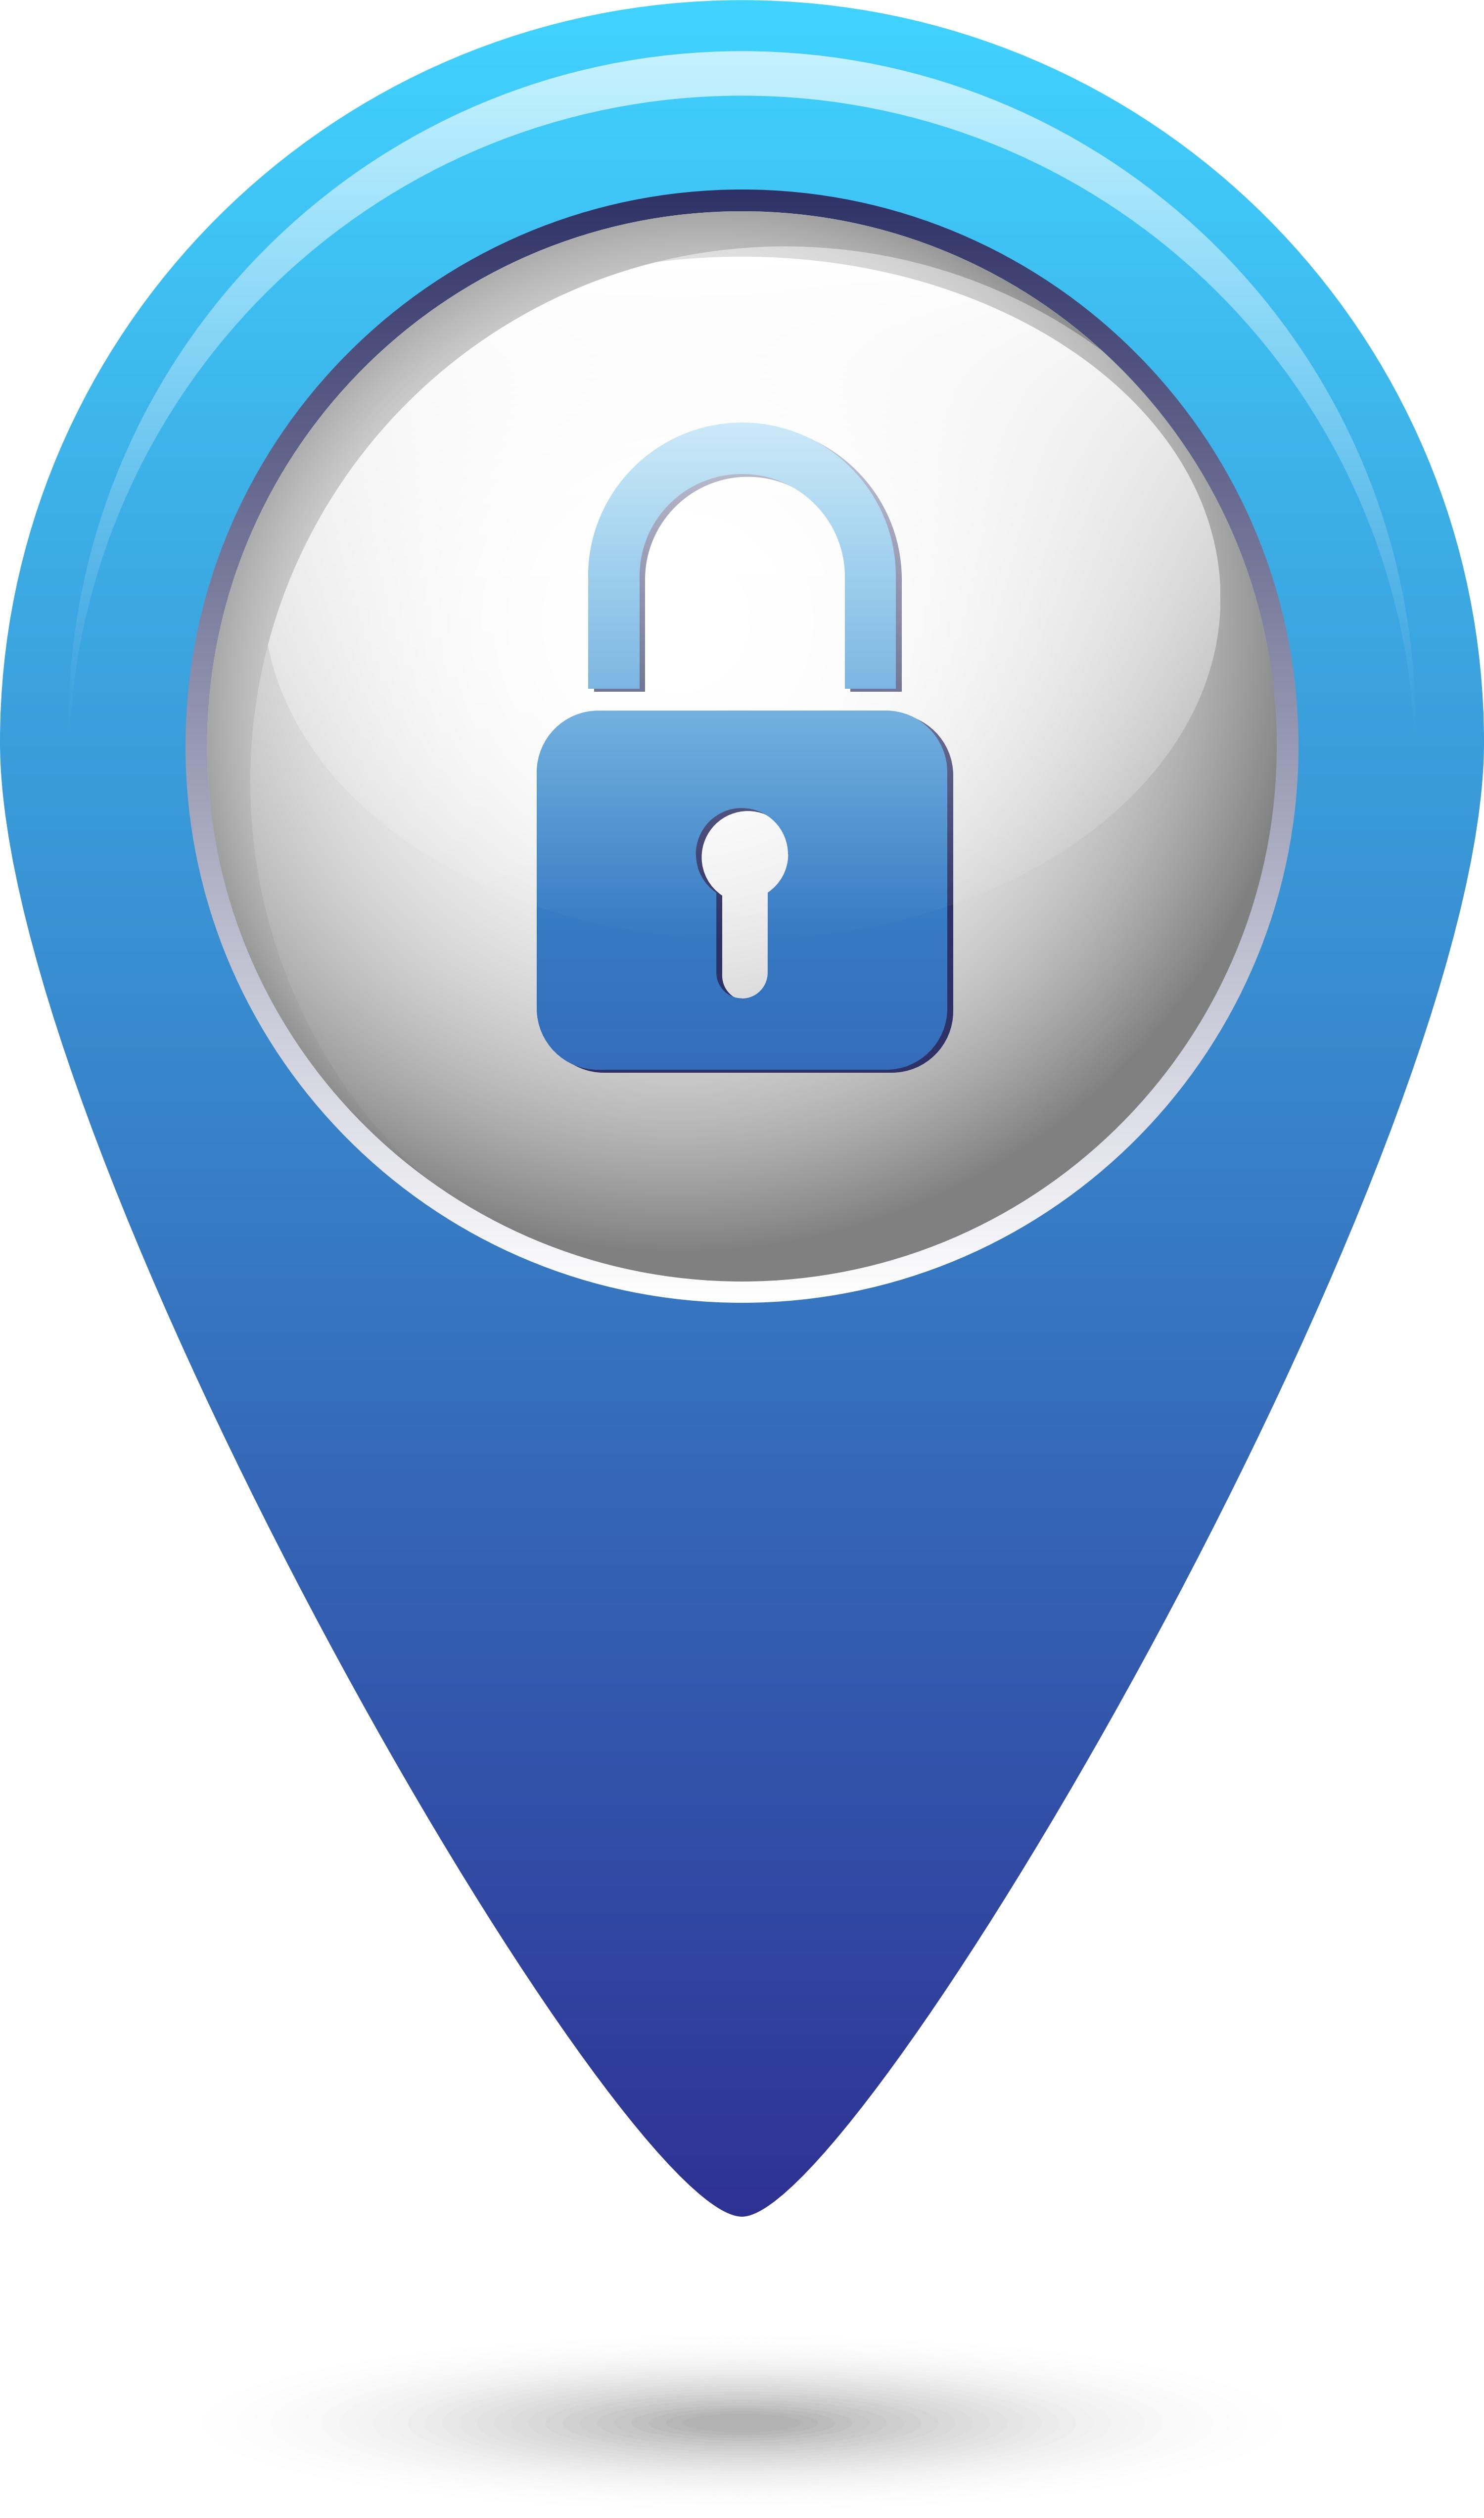 geospatial privacy